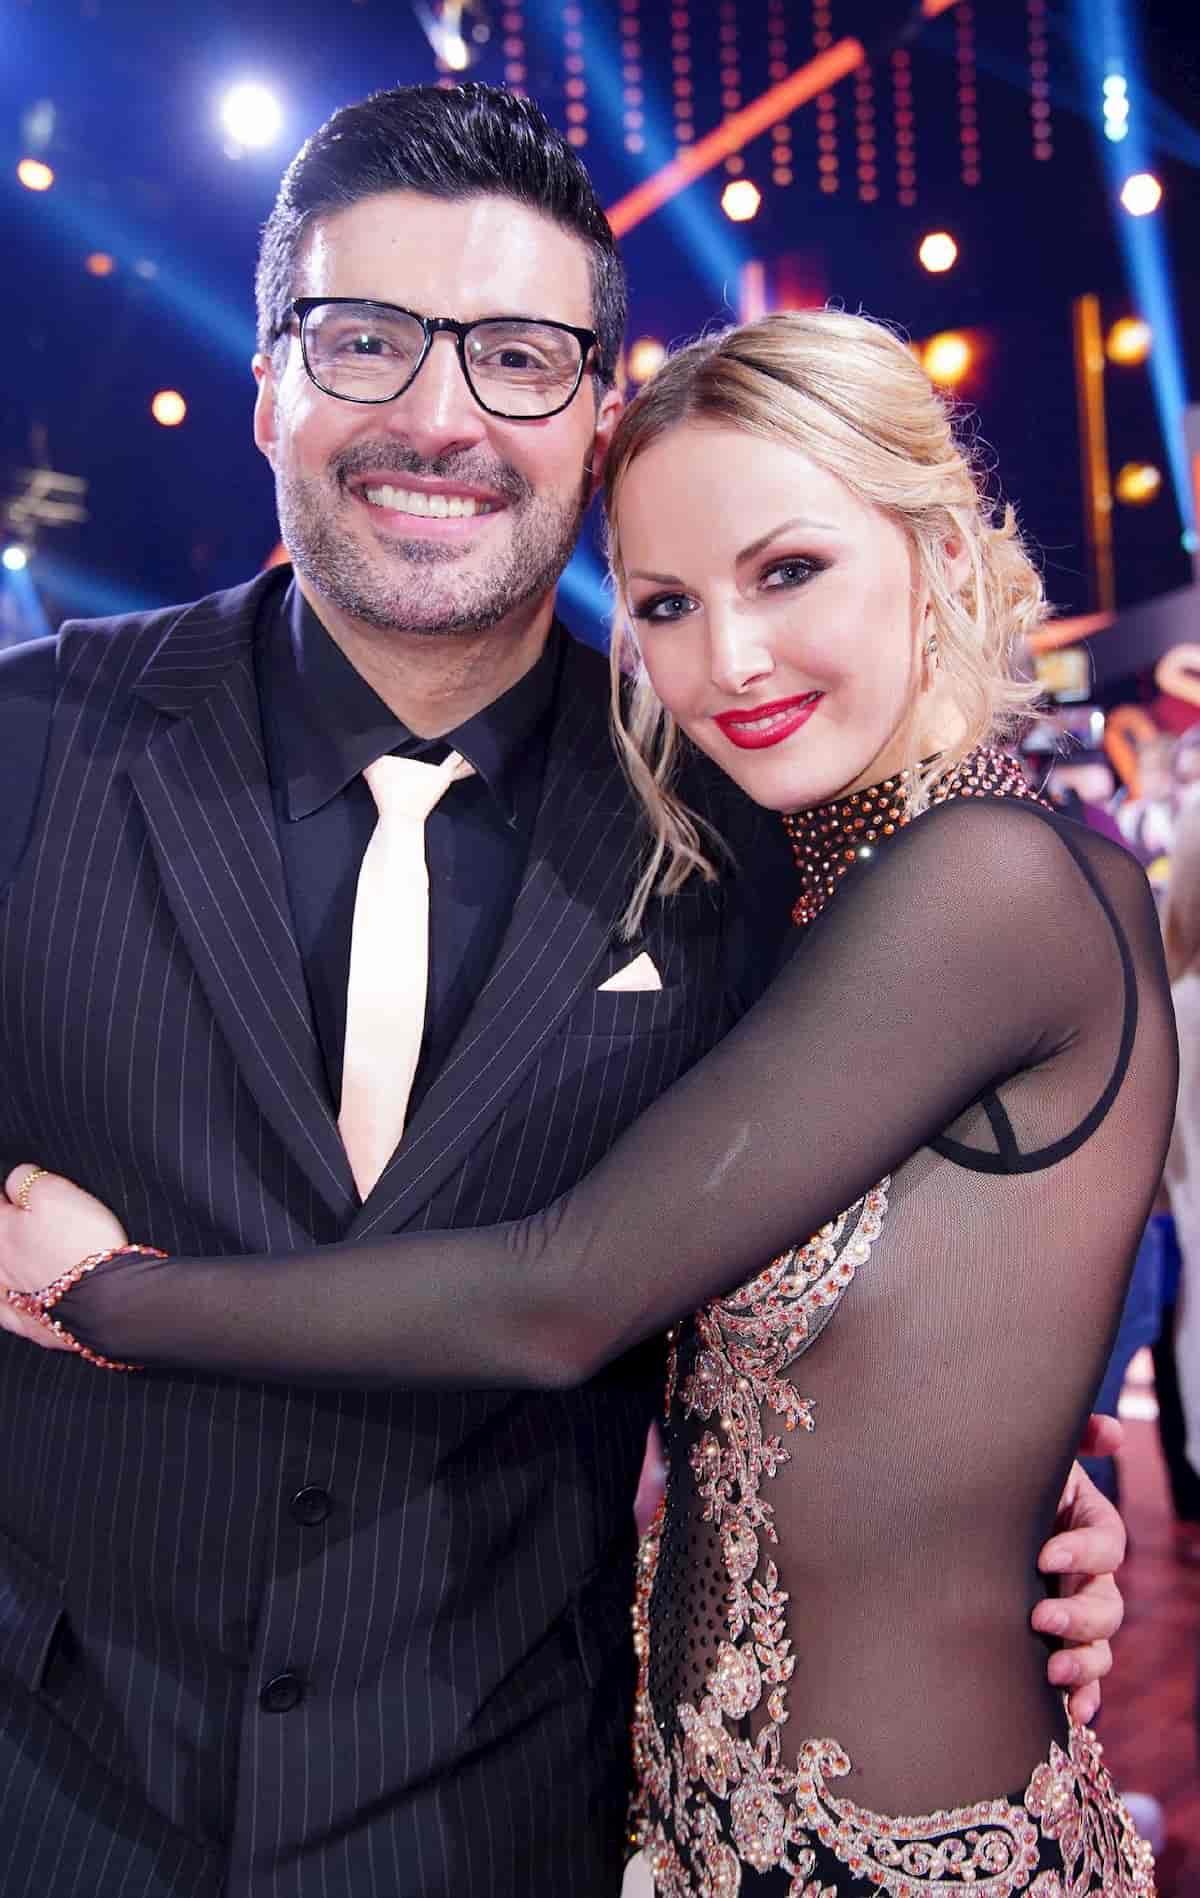 Sükrü Pehlivan –Alona Uehlin als Tanzpaar bei Let's dance 2020